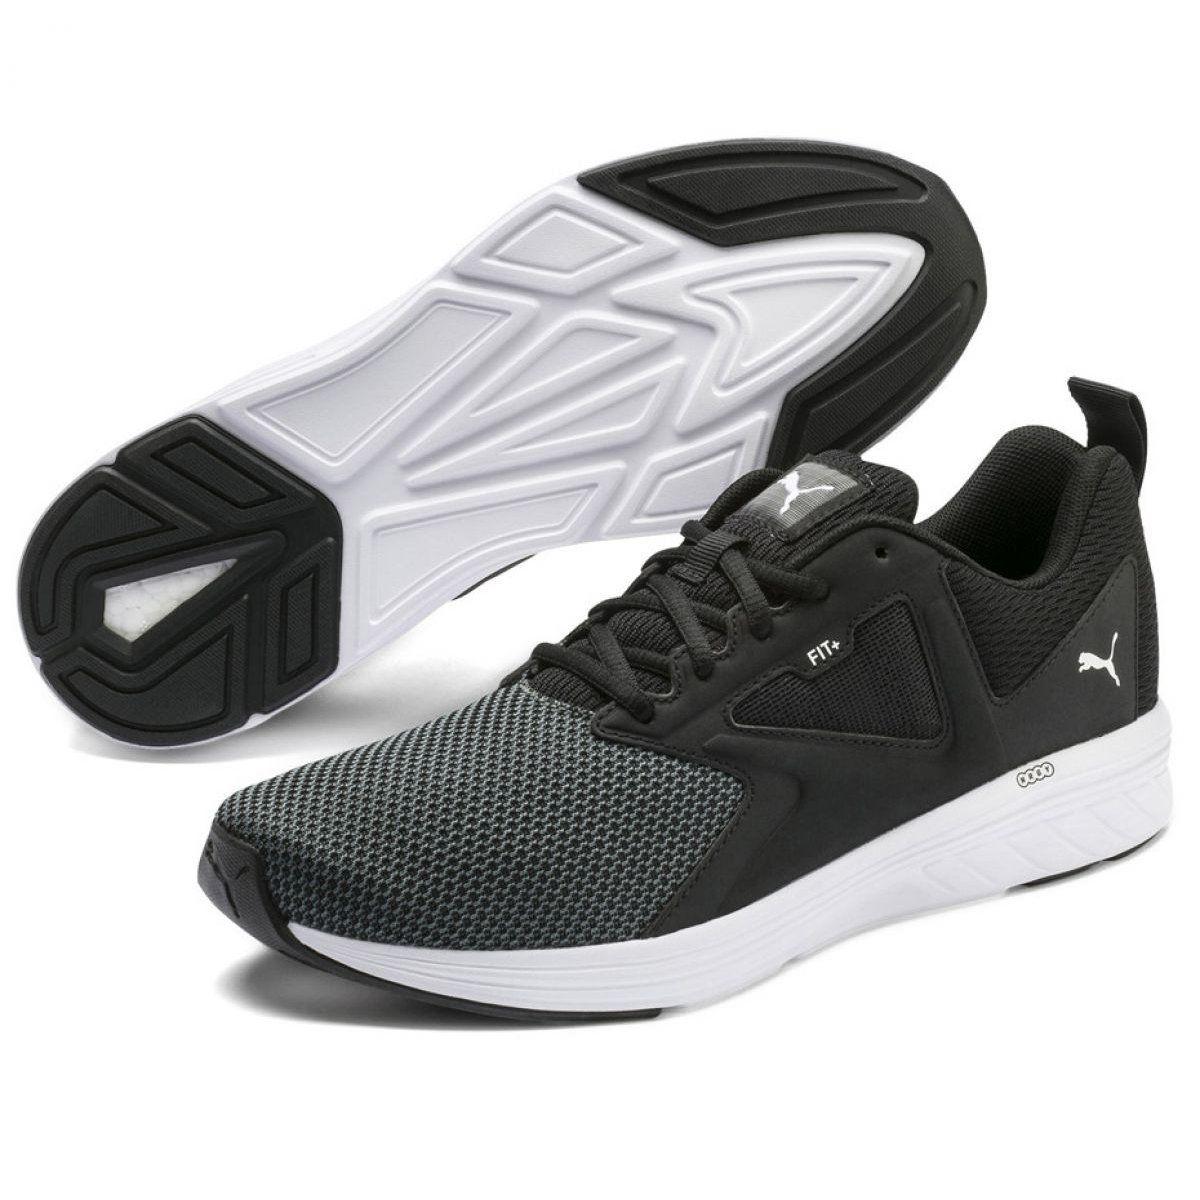 Buty Puma Nrgy Asteroid M 192804 01 Czarne Puma Sneakers Sneakers Nike